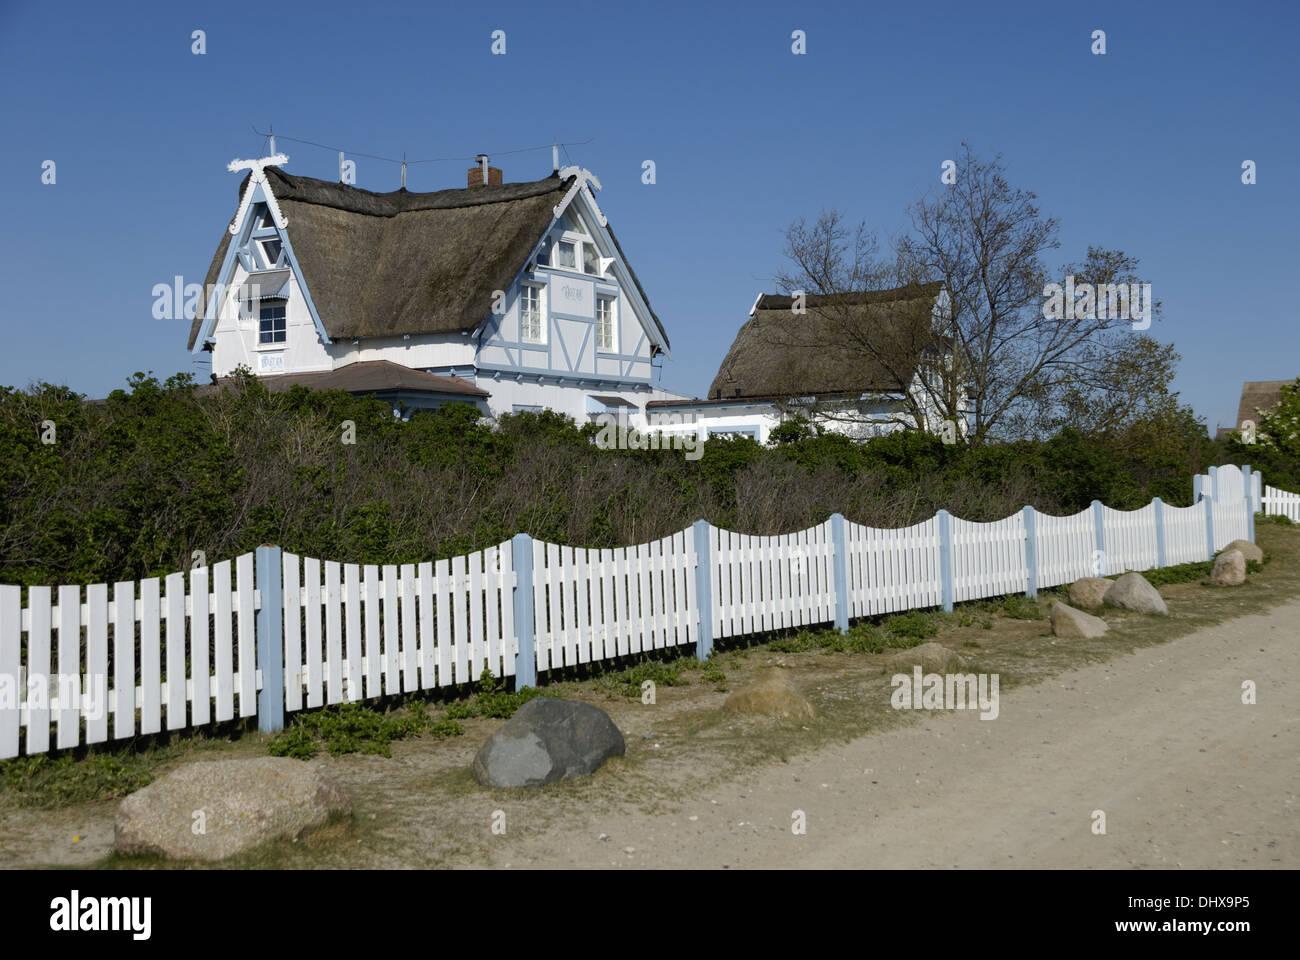 Houses on Graswarder in Heiligenhafen Stock Photo